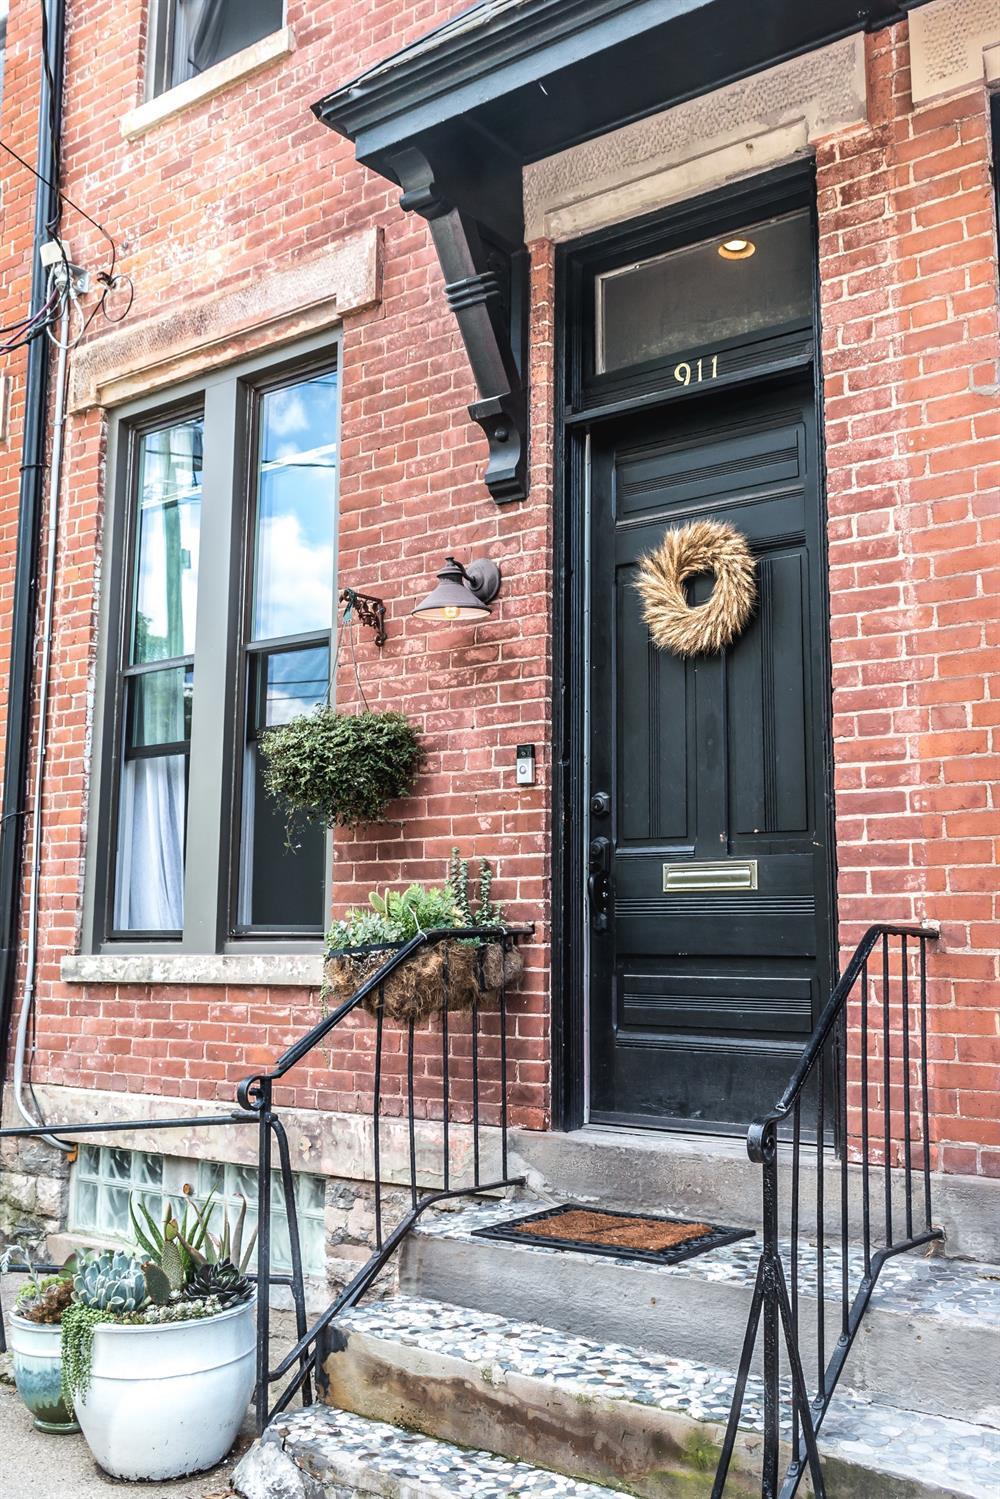 Property for sale at 911 Paradrome Street, Cincinnati,  Ohio 45202